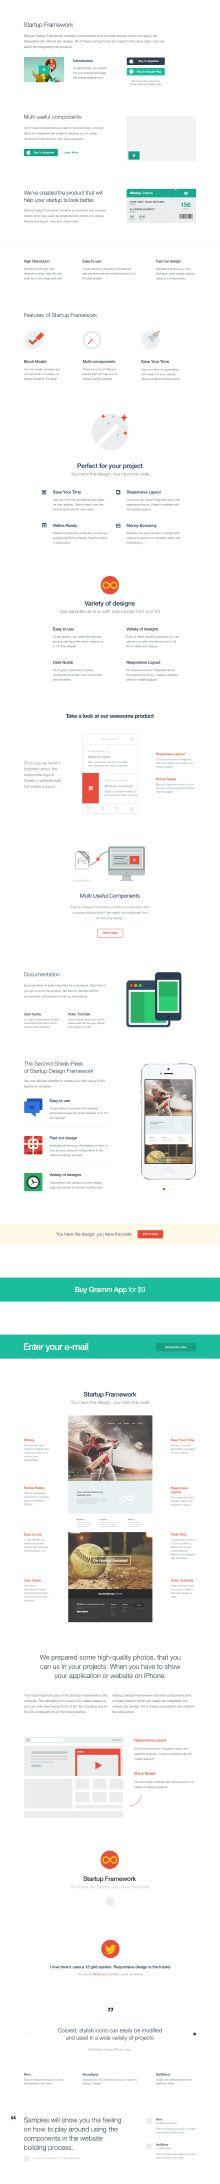 http://designmodo.com/startup/ Components: Content Blocks